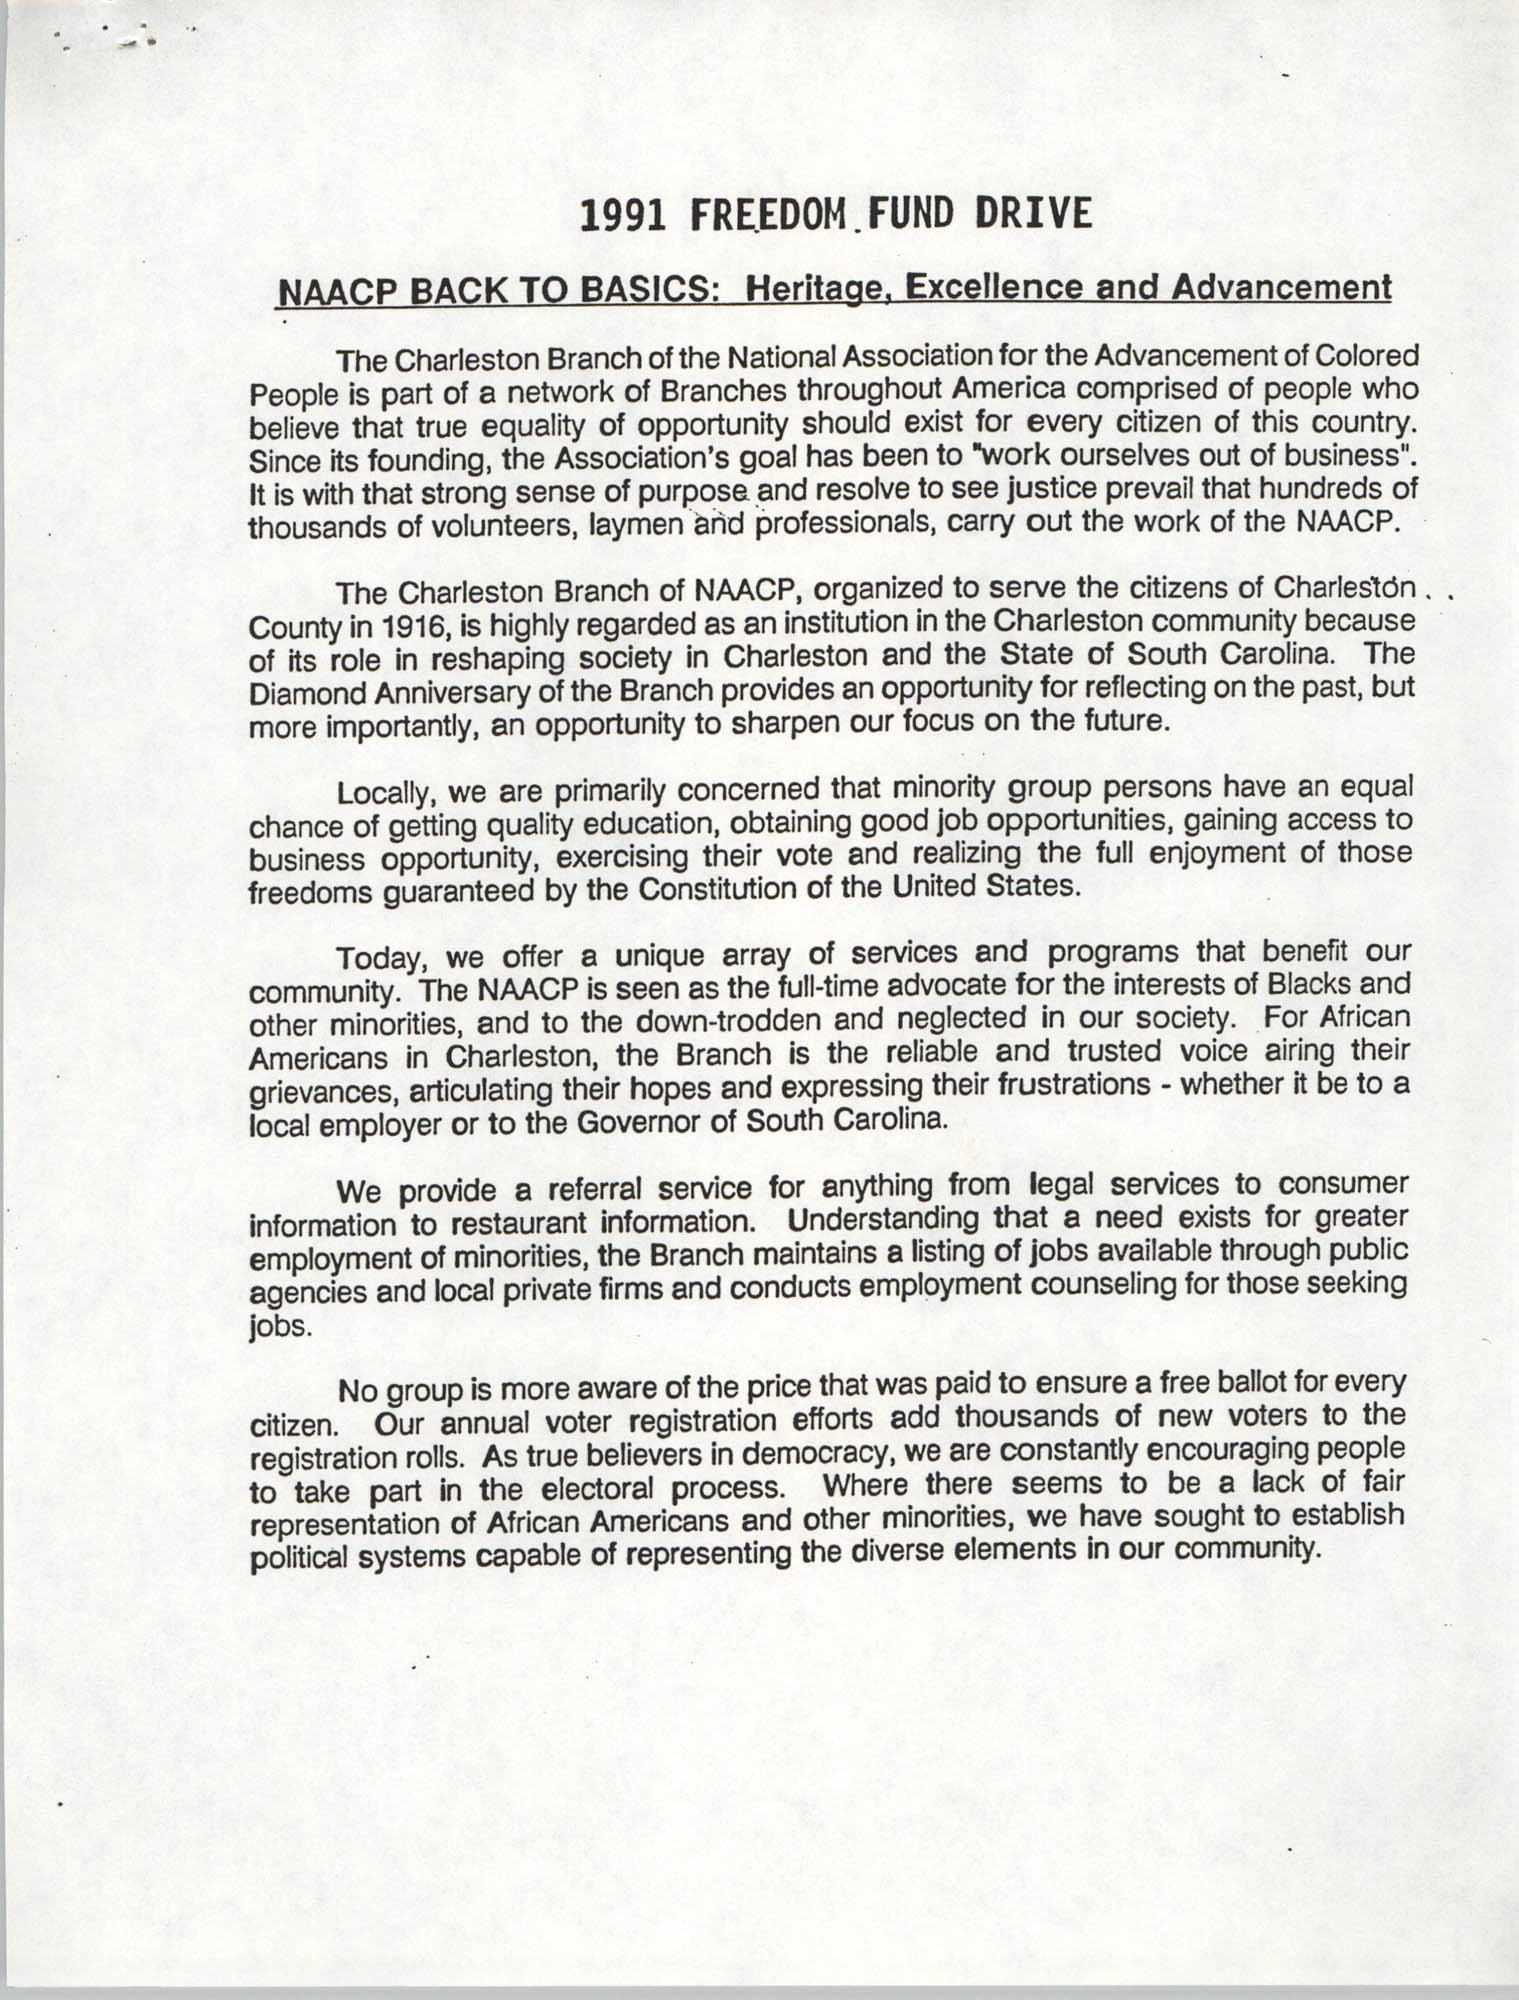 NAACP Back To Basics, 1991 Freedom Fund Drive